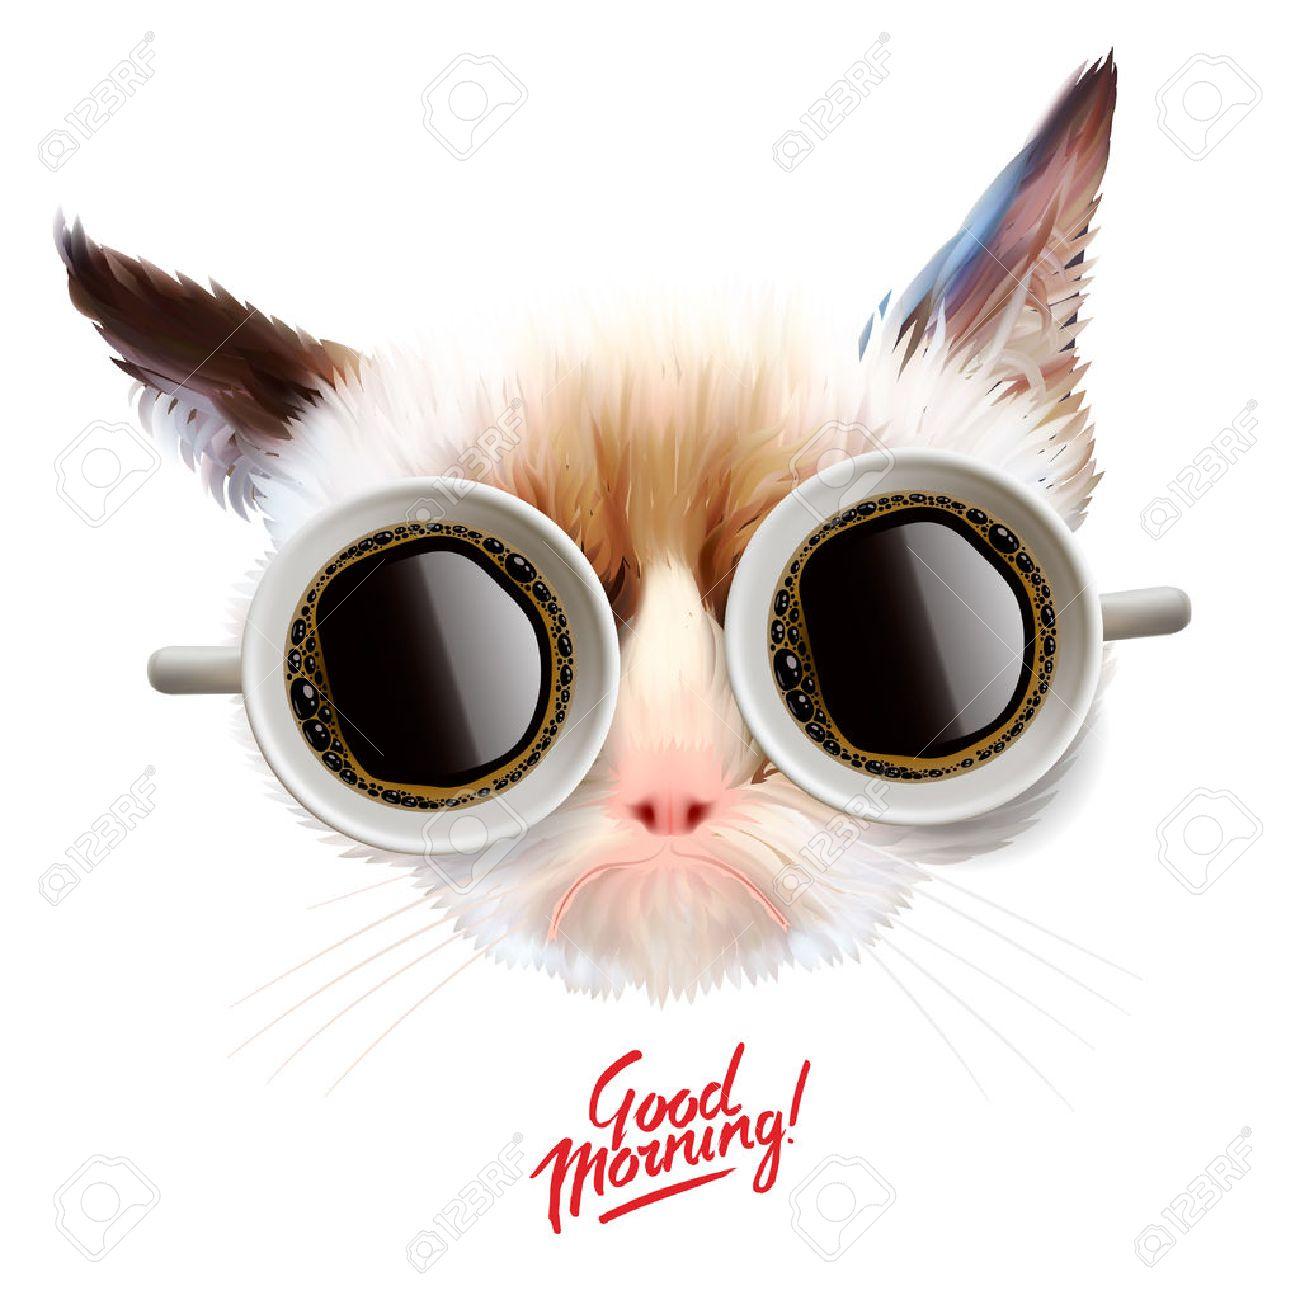 Lustige Katze mit Tassen Kaffee Gläser, Illustration. Standard-Bild - 42394442